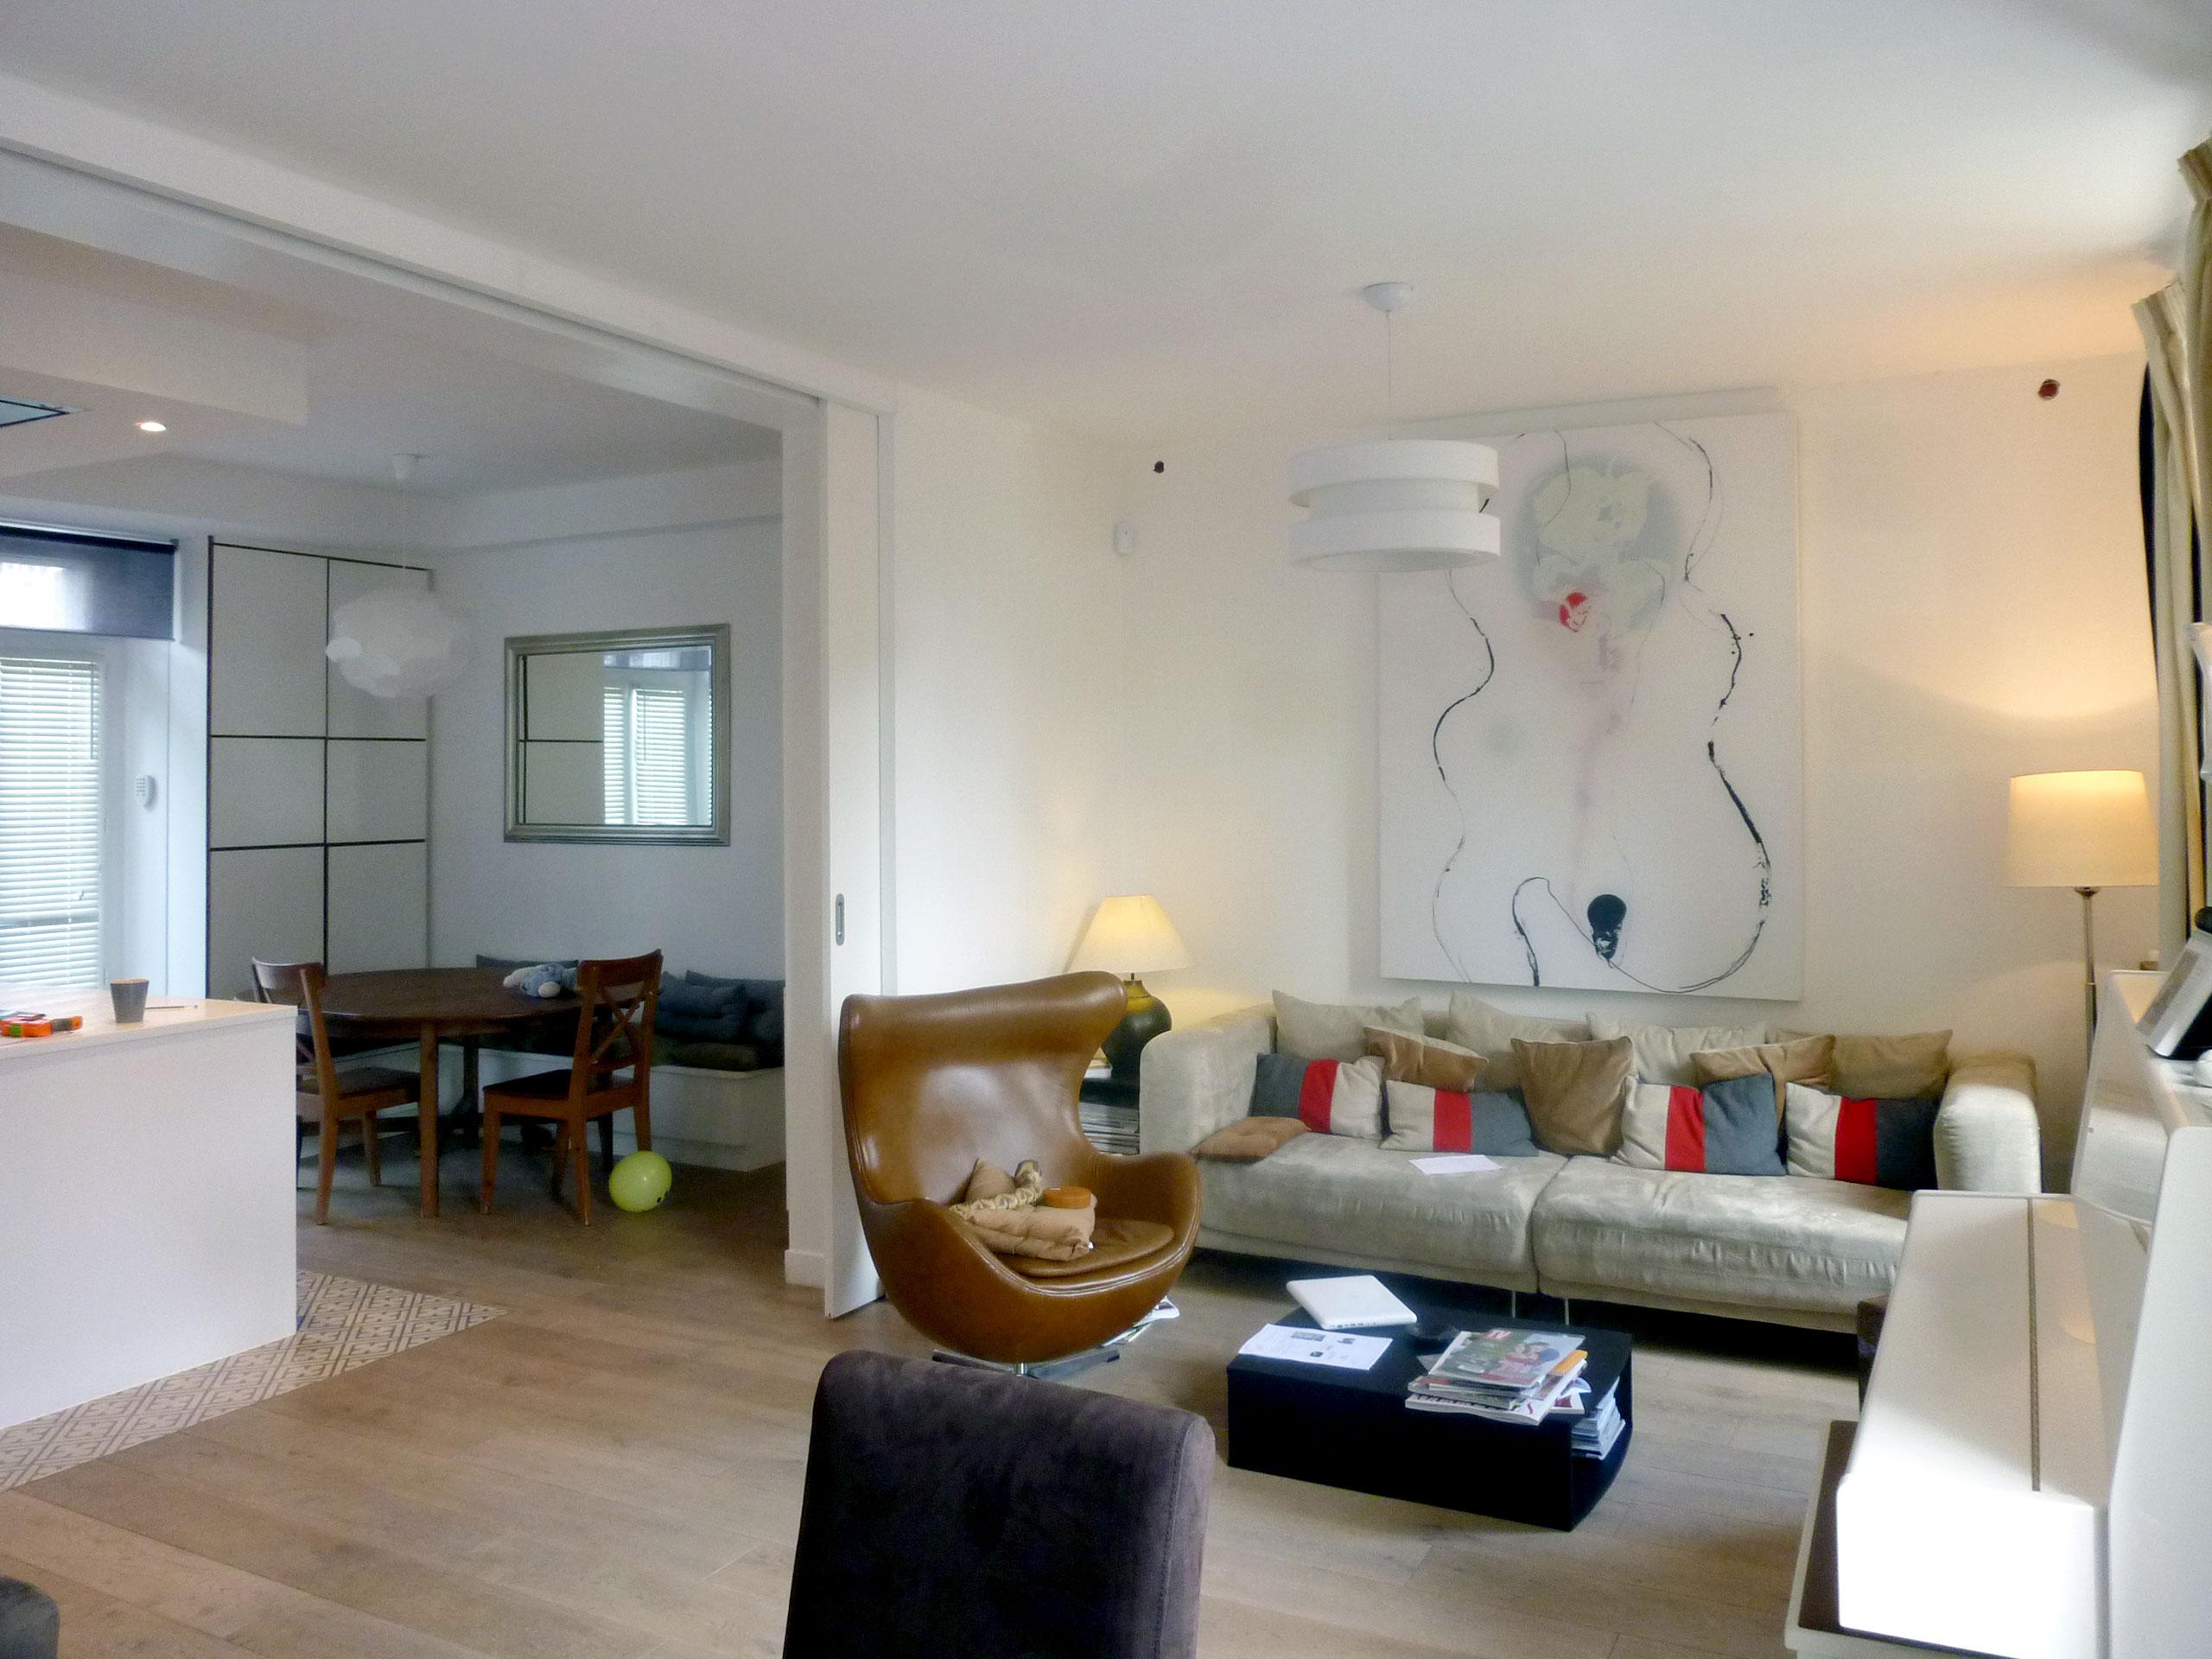 olivier-stadler-architecte-meudon-rehabilitation-extensions-maison (17)